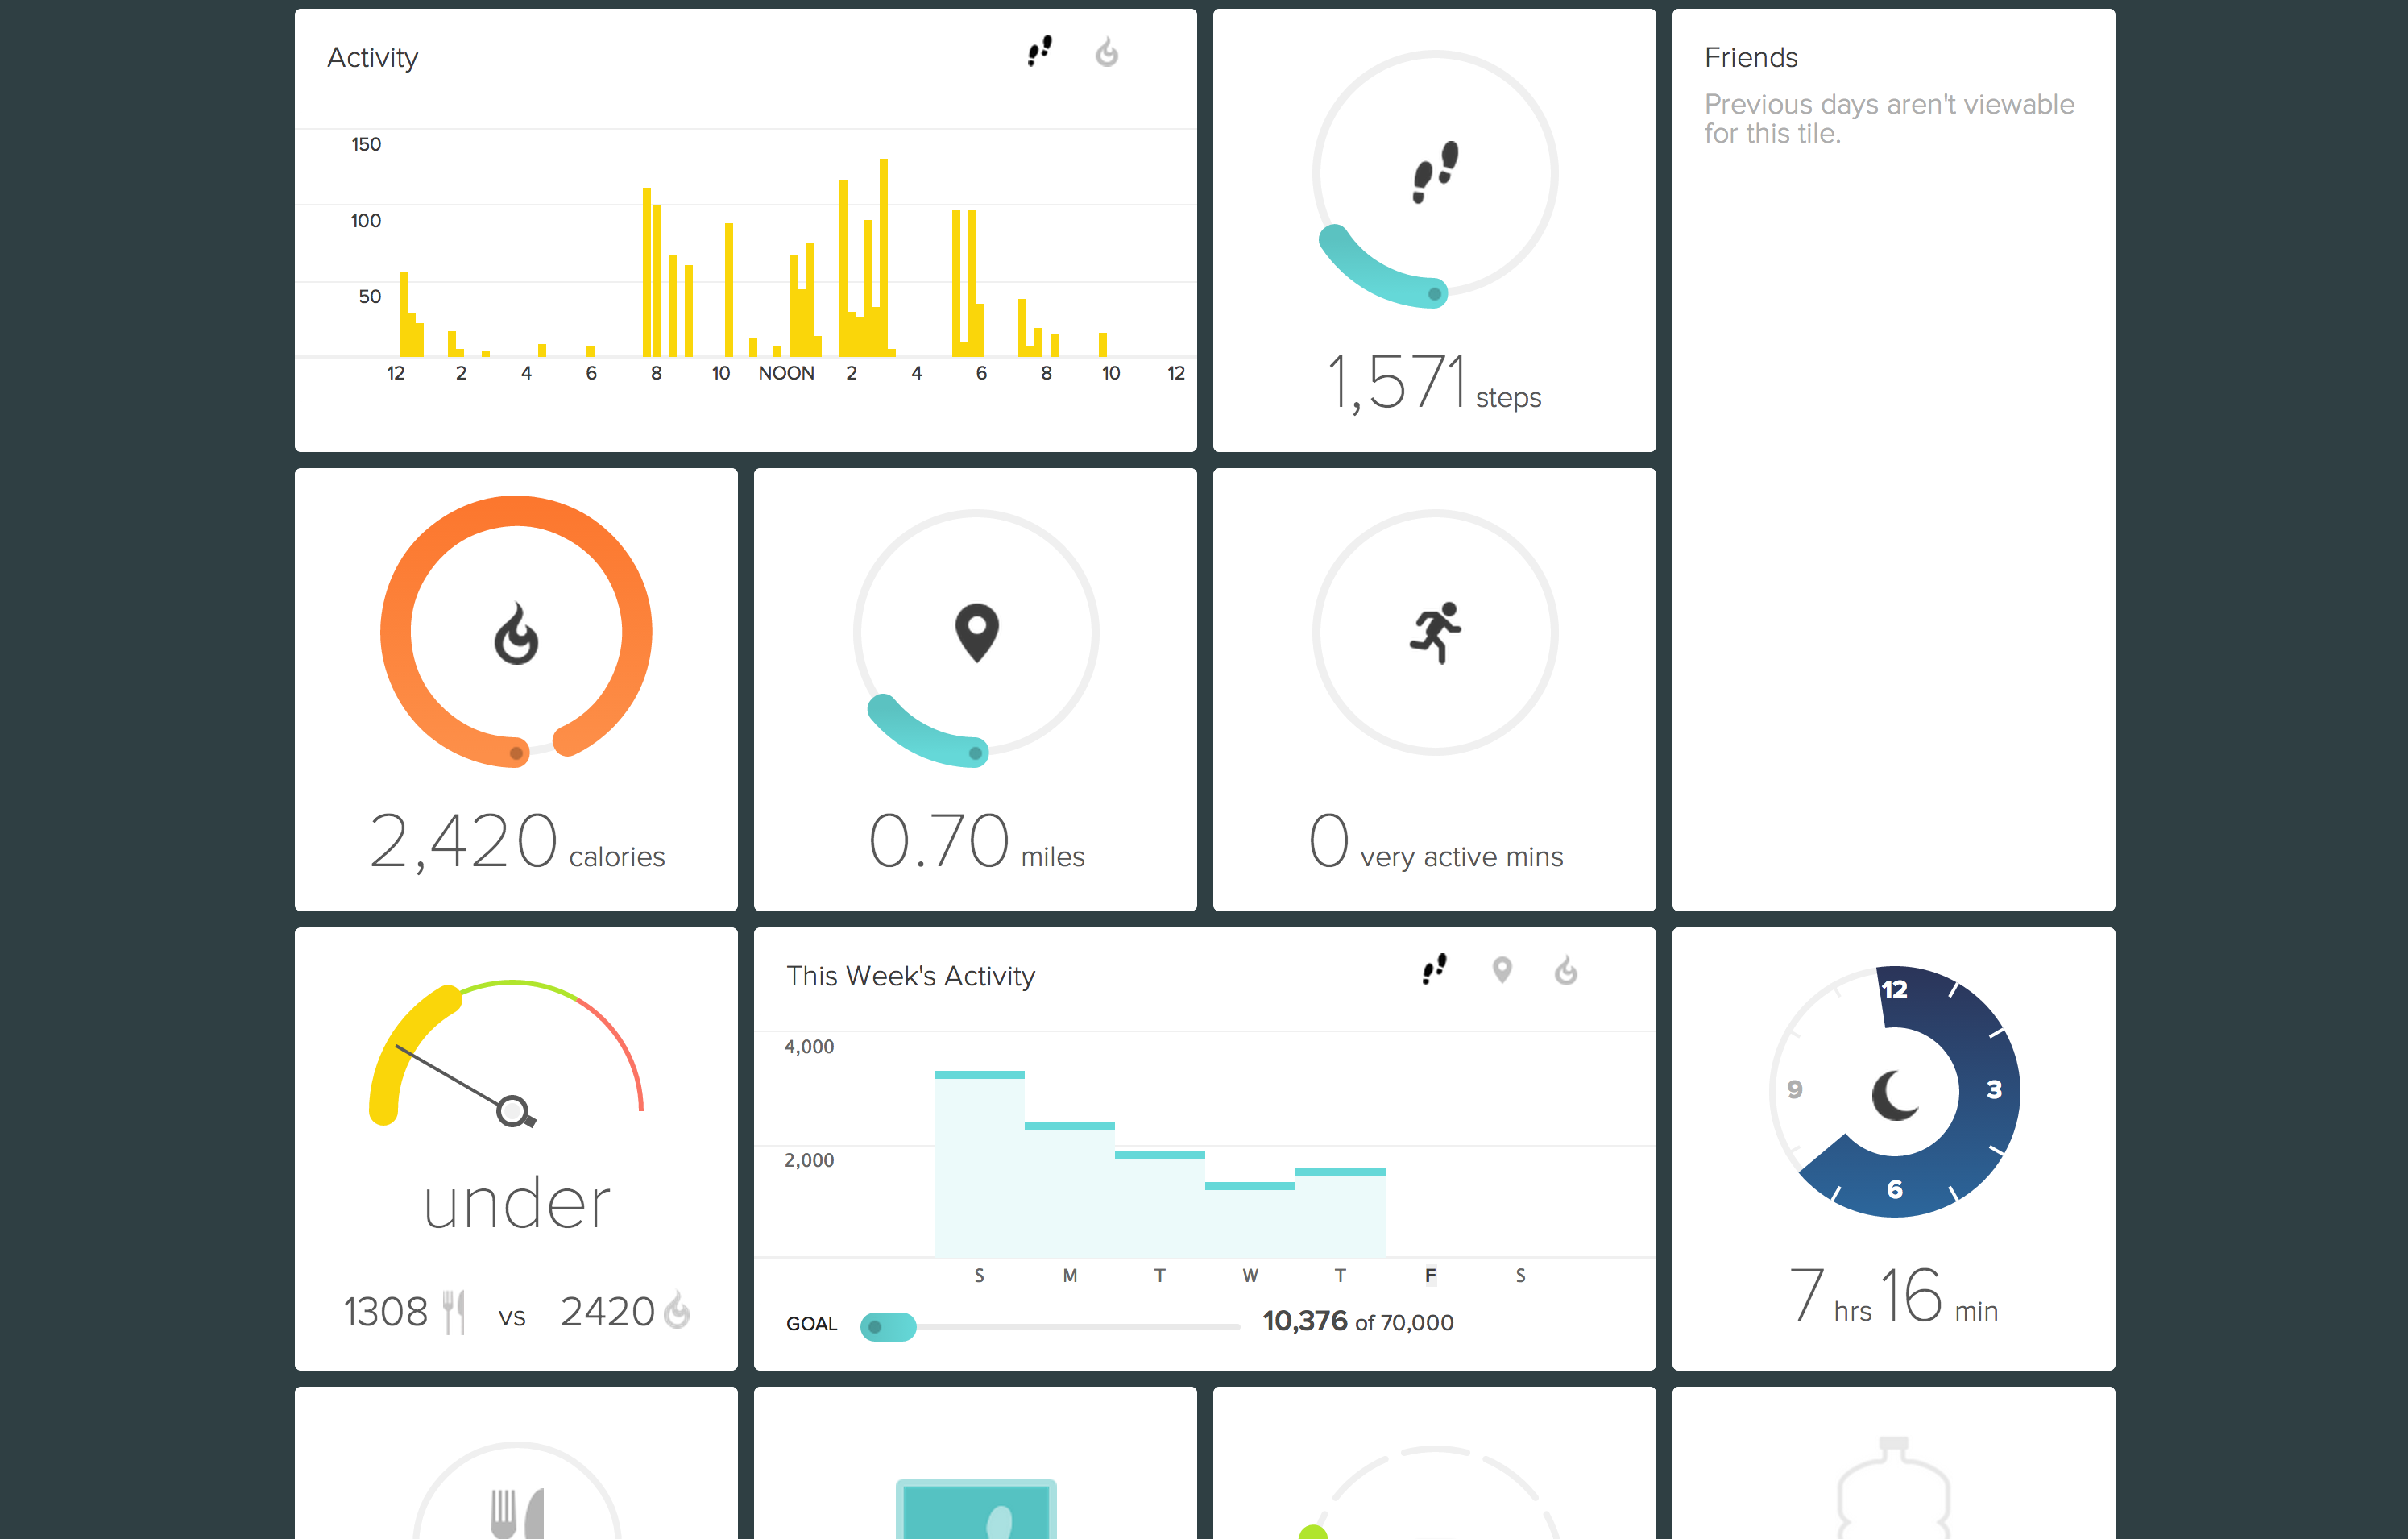 My FitBit dashboard